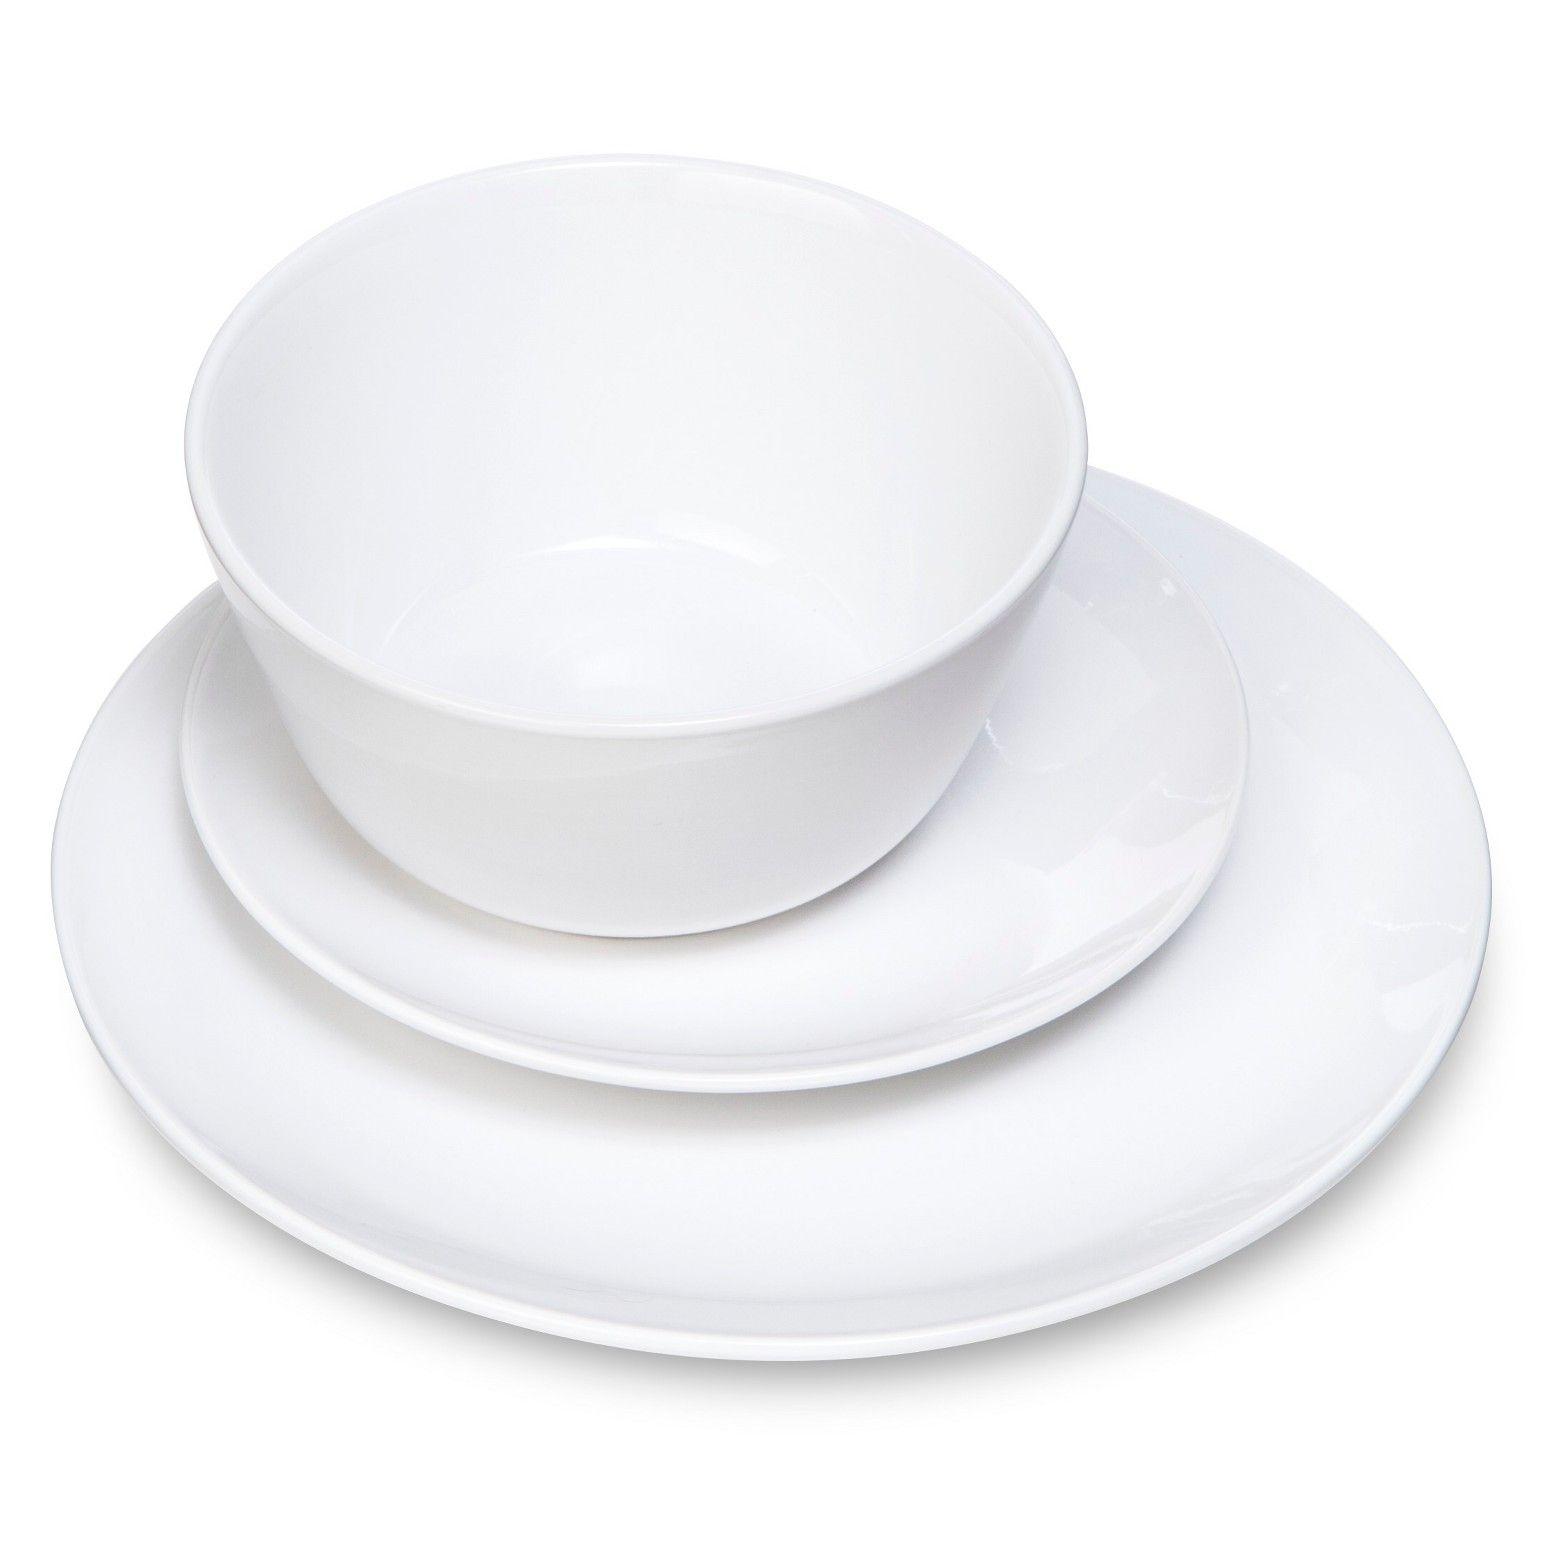 Coupe 12pc Dinnerware Set White Room Essentials White